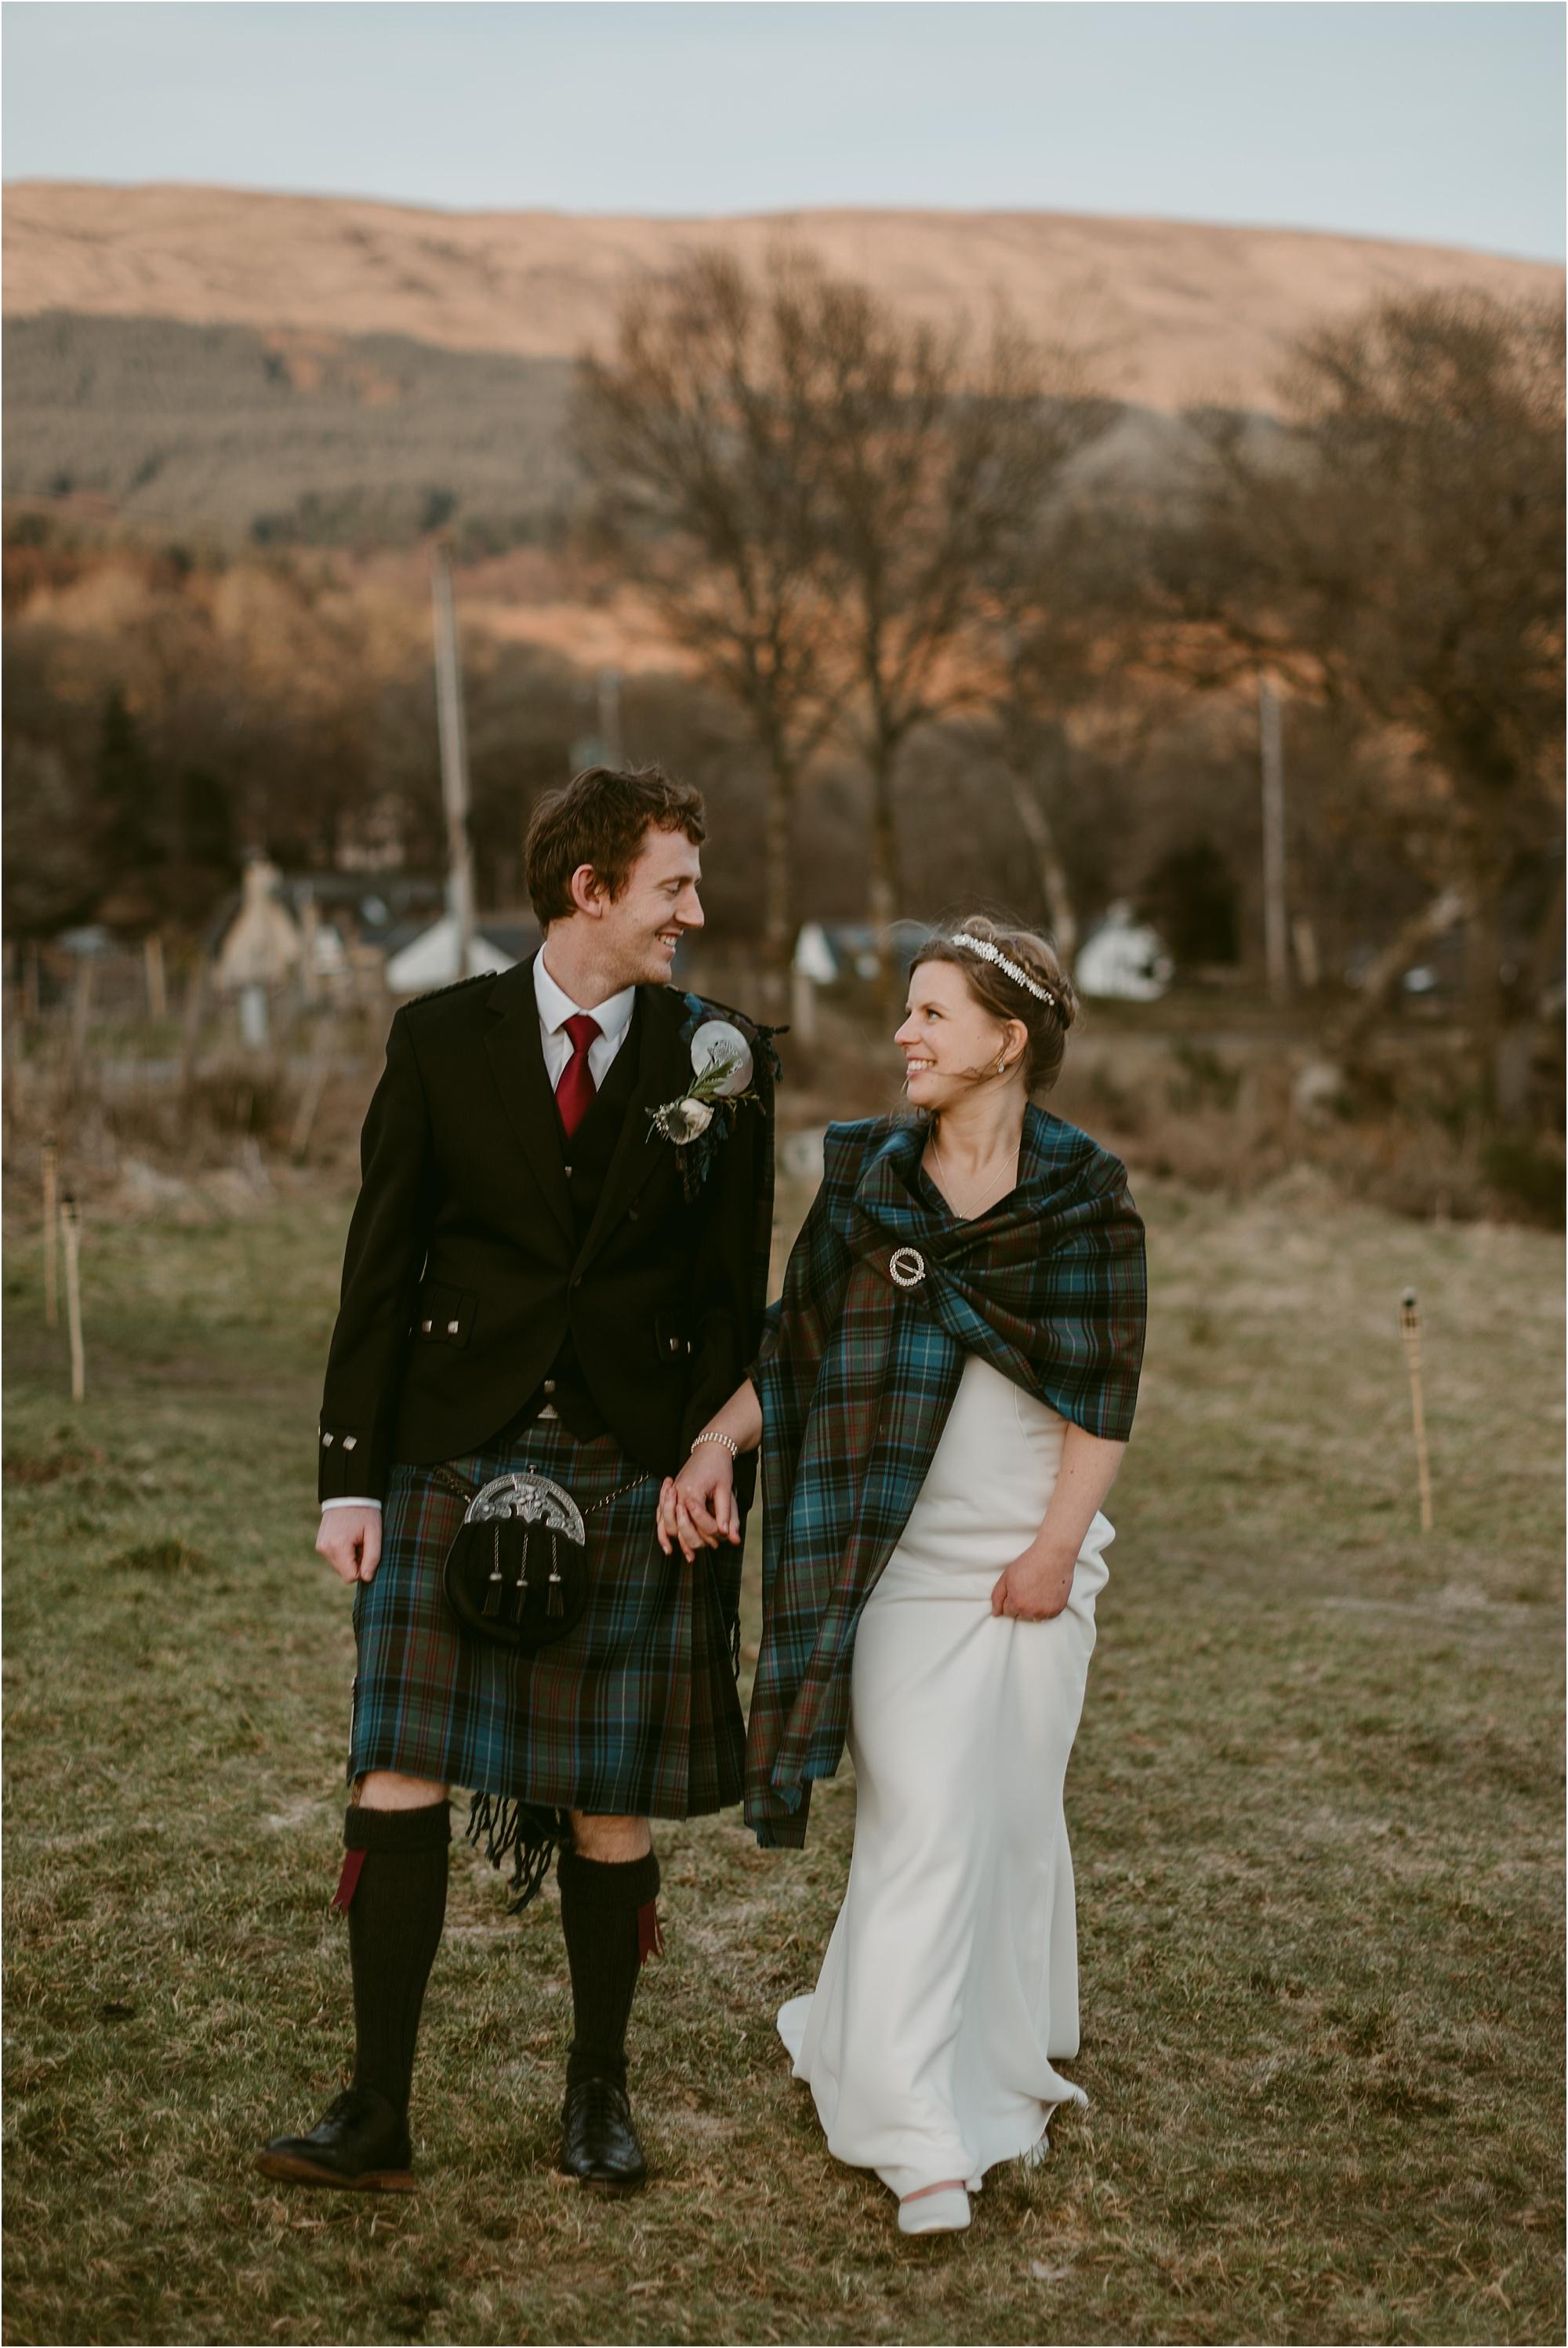 Kinlochard-village-hall-scottish-wedding-claire-fleck-photography__0099.jpg